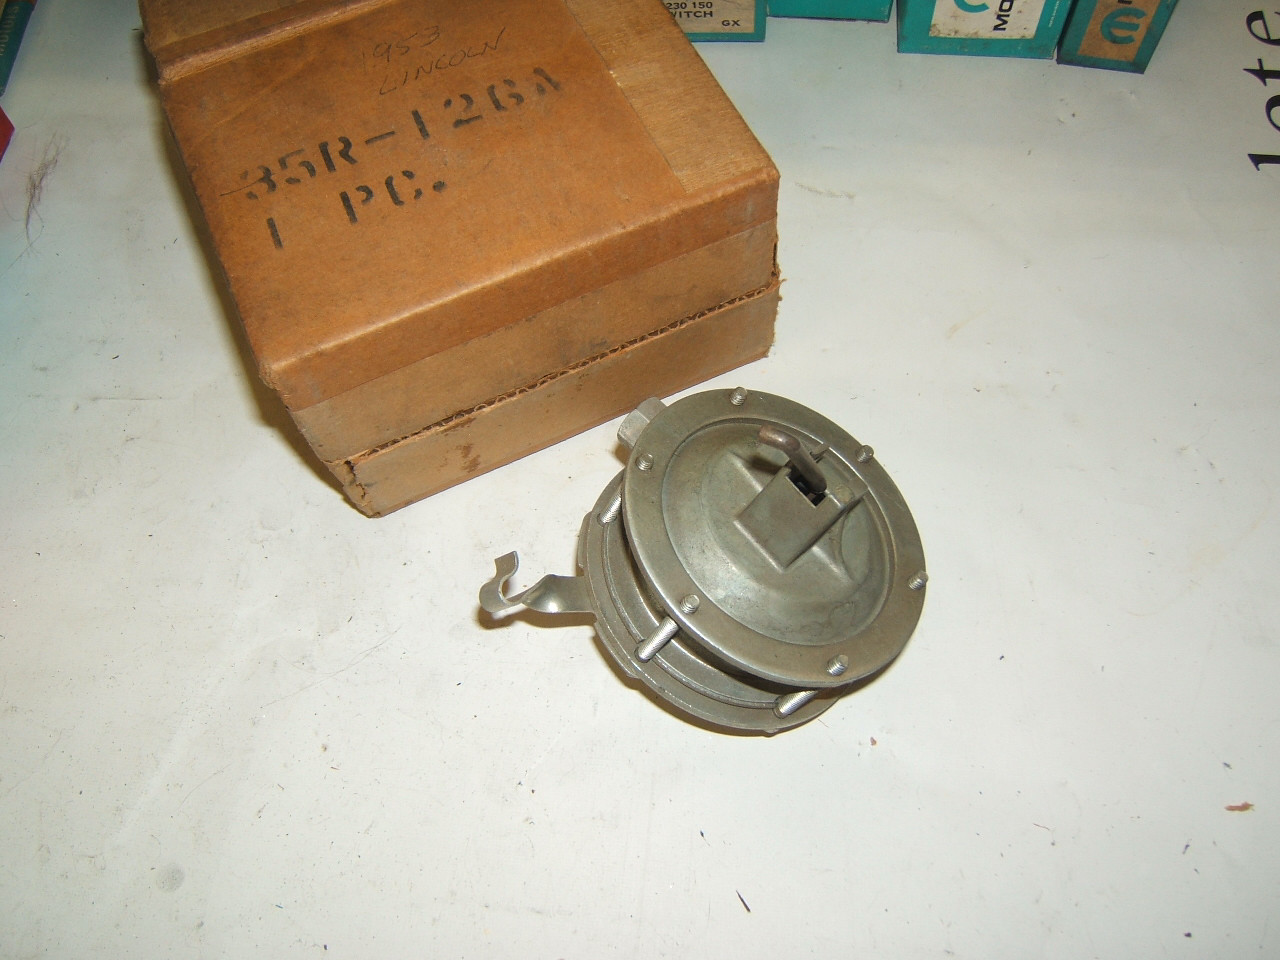 1953 lincoln Distributor vacuum advance nos (a 35r-126a)